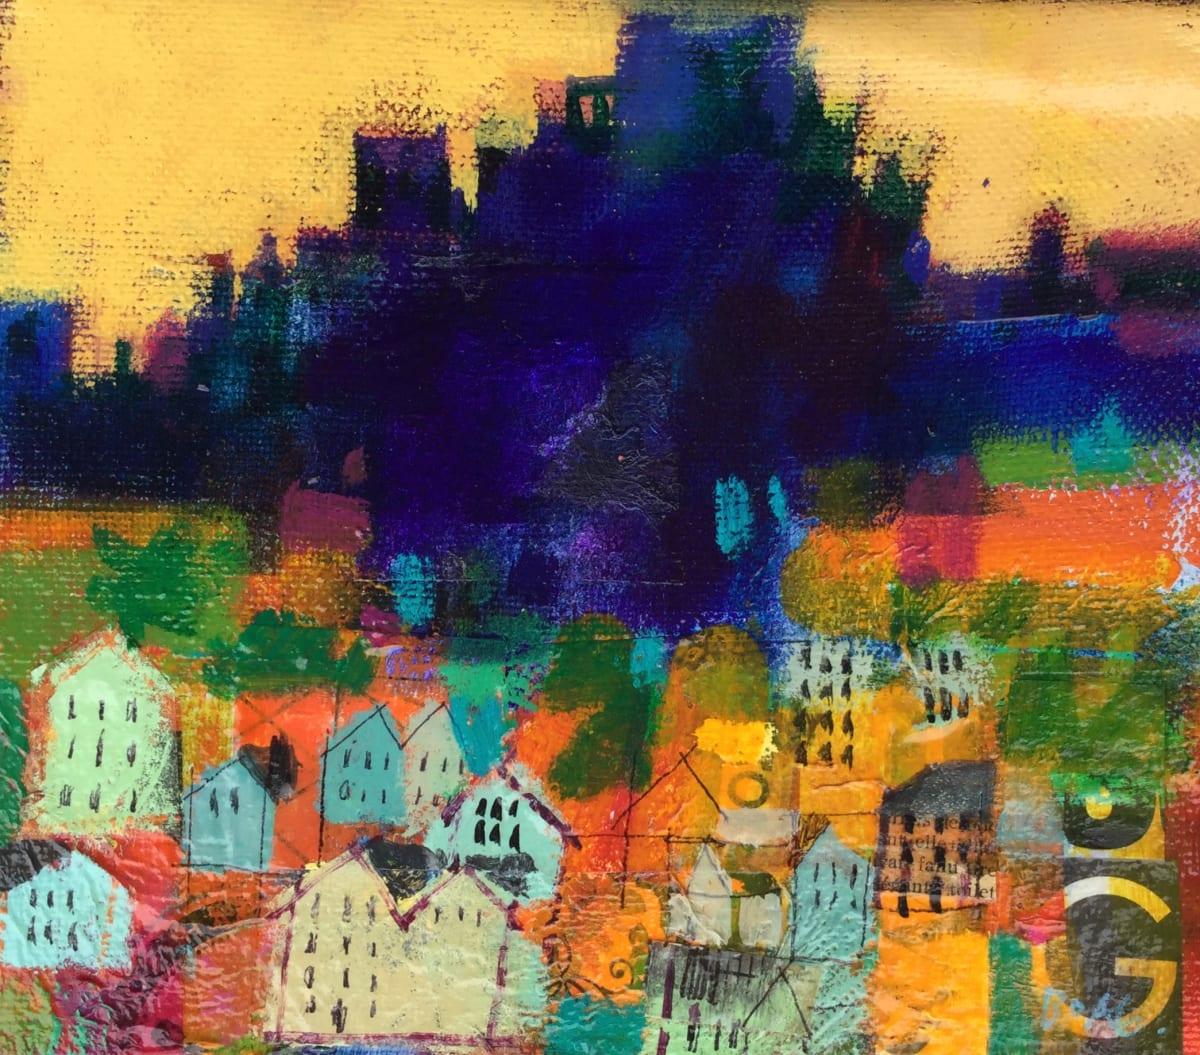 Edinburgh Castle, morning by francis boag